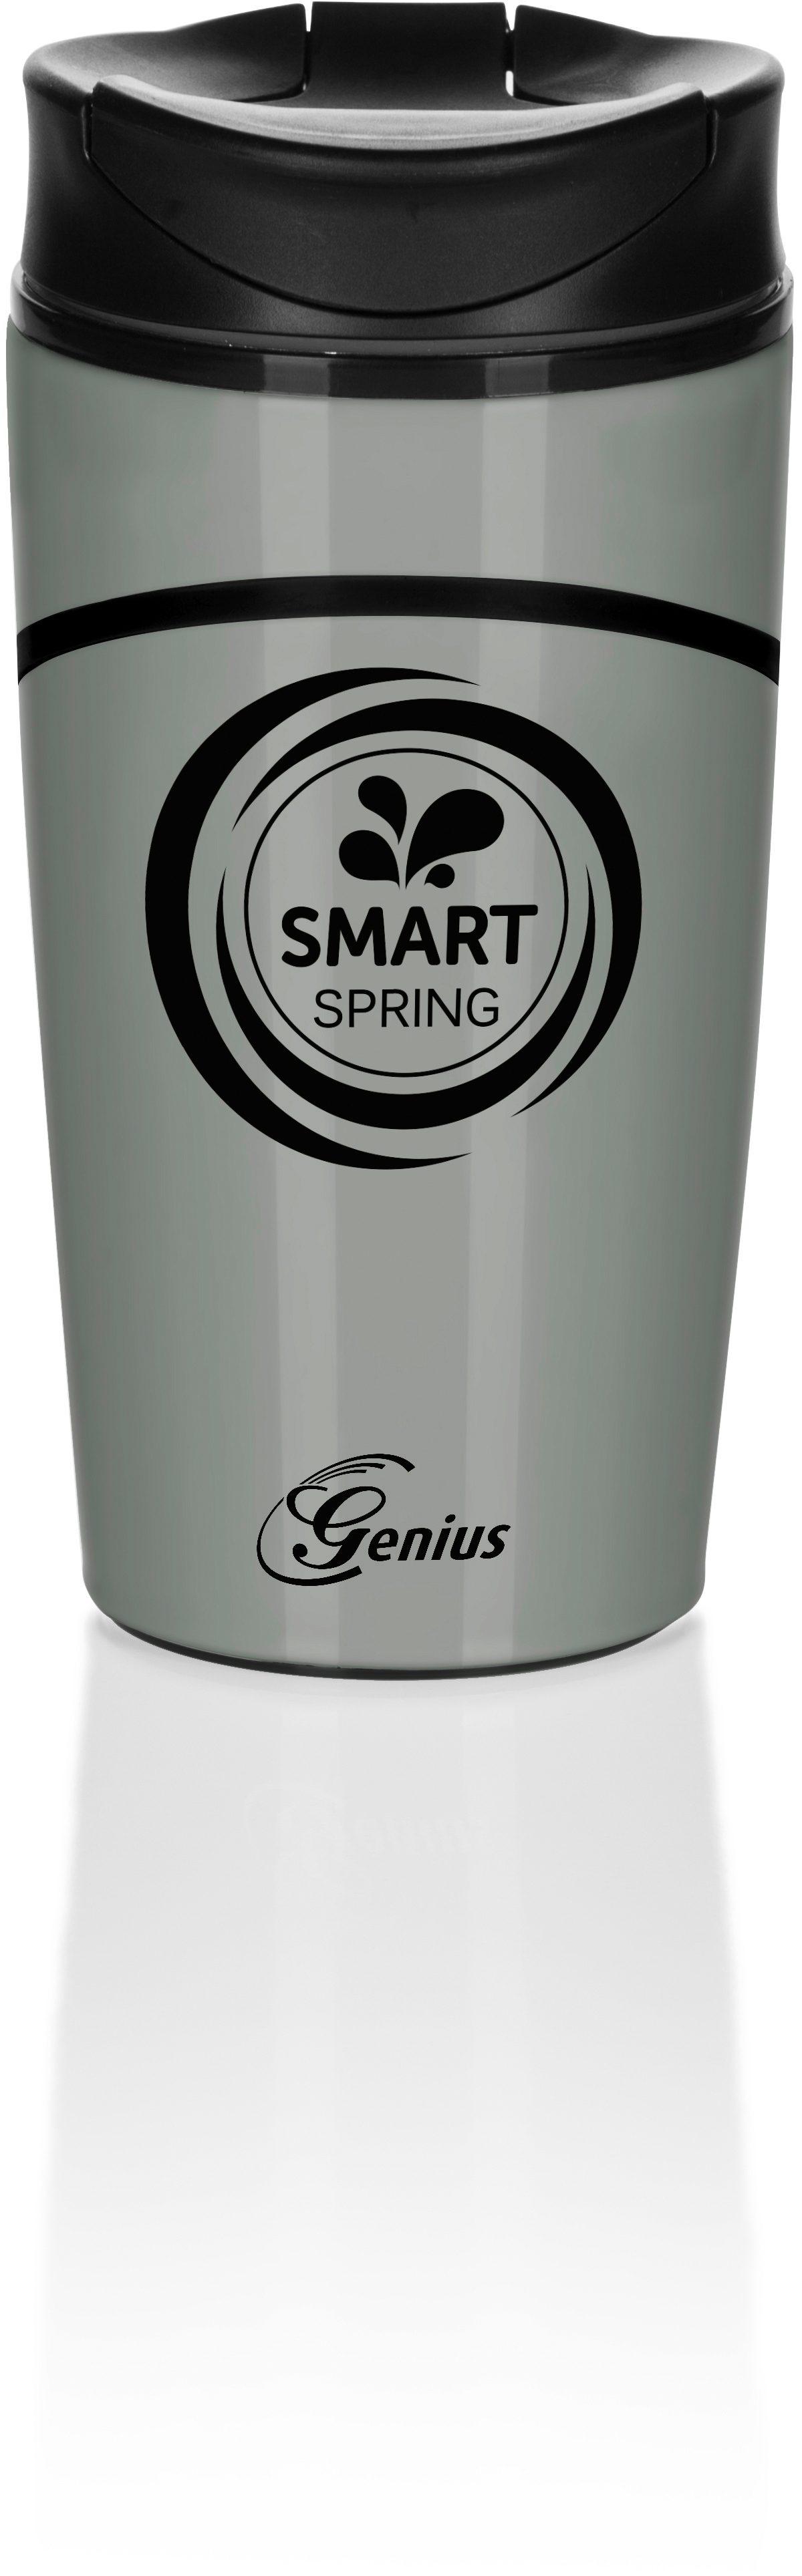 Genius® Thermobecher, 300 ml, »Smart Spring«